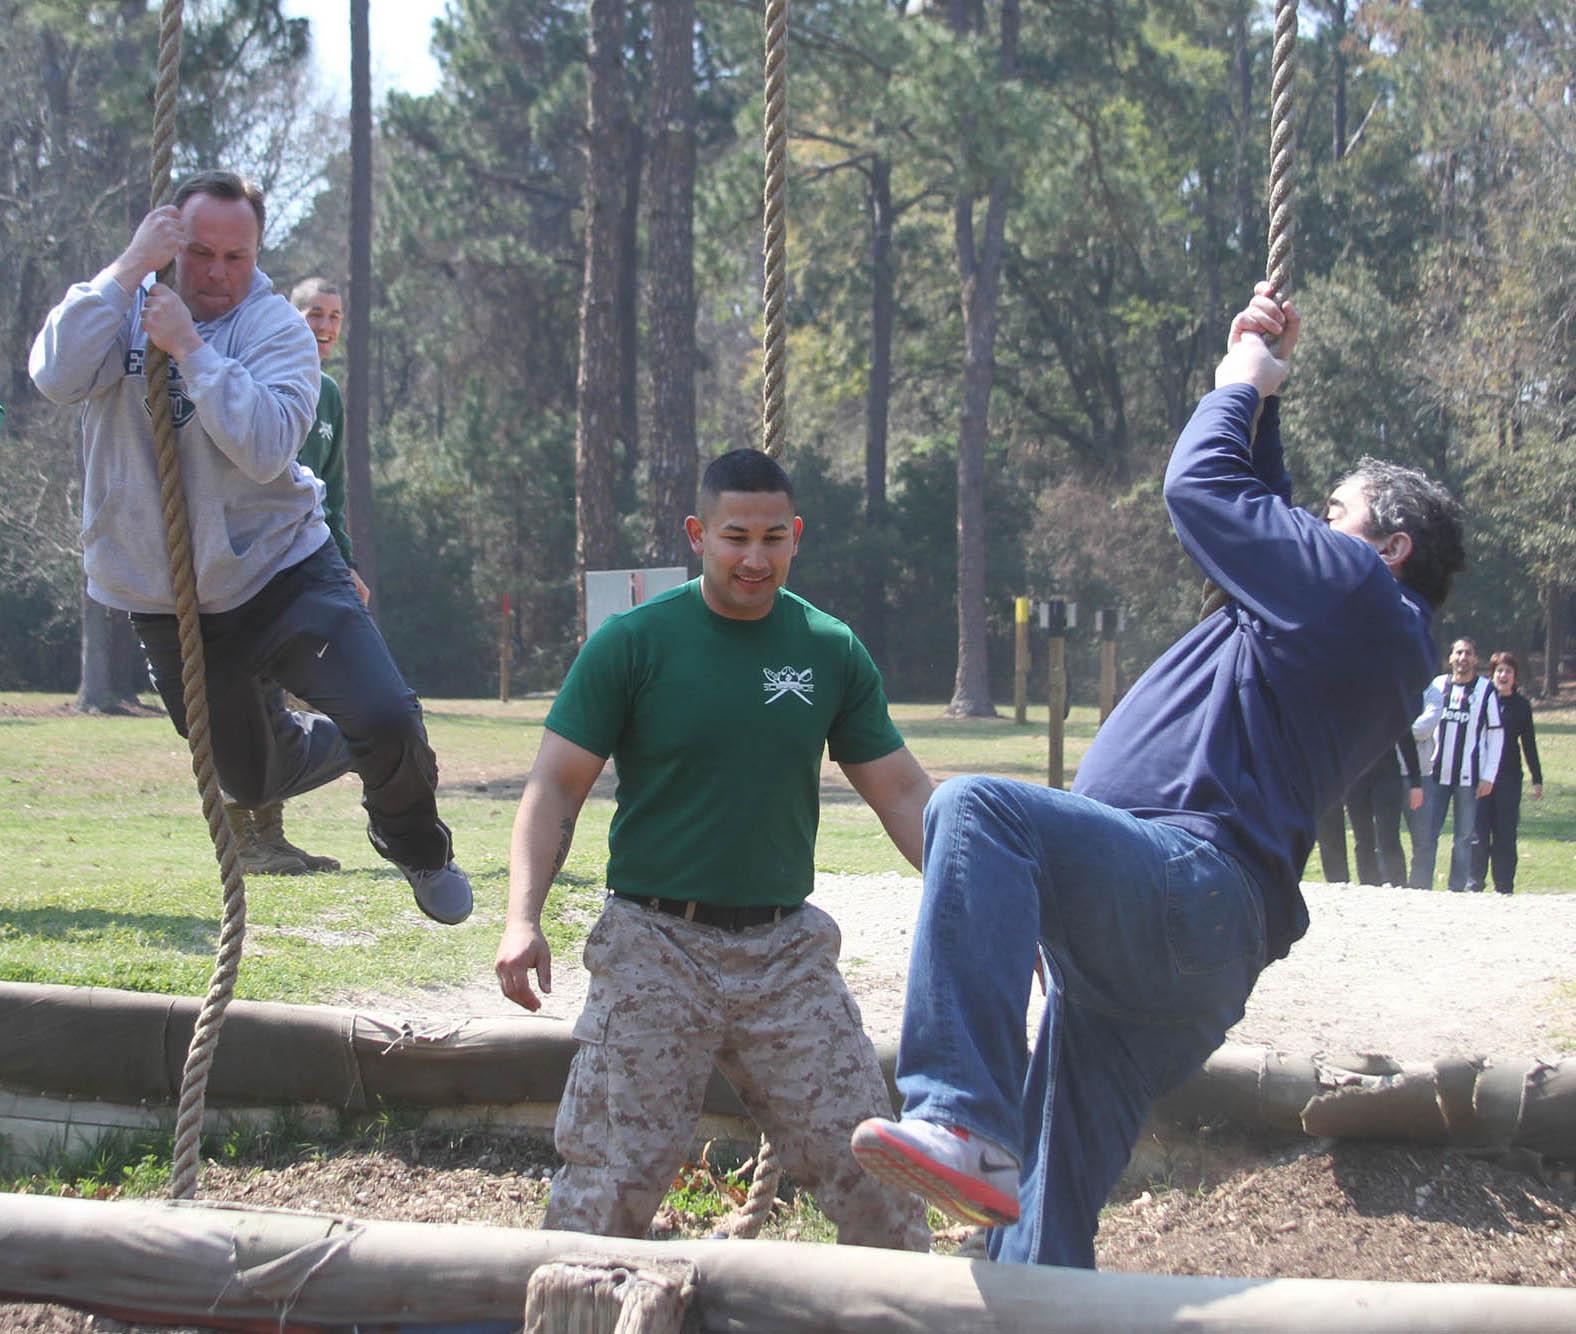 files/images/Marines_01.jpg